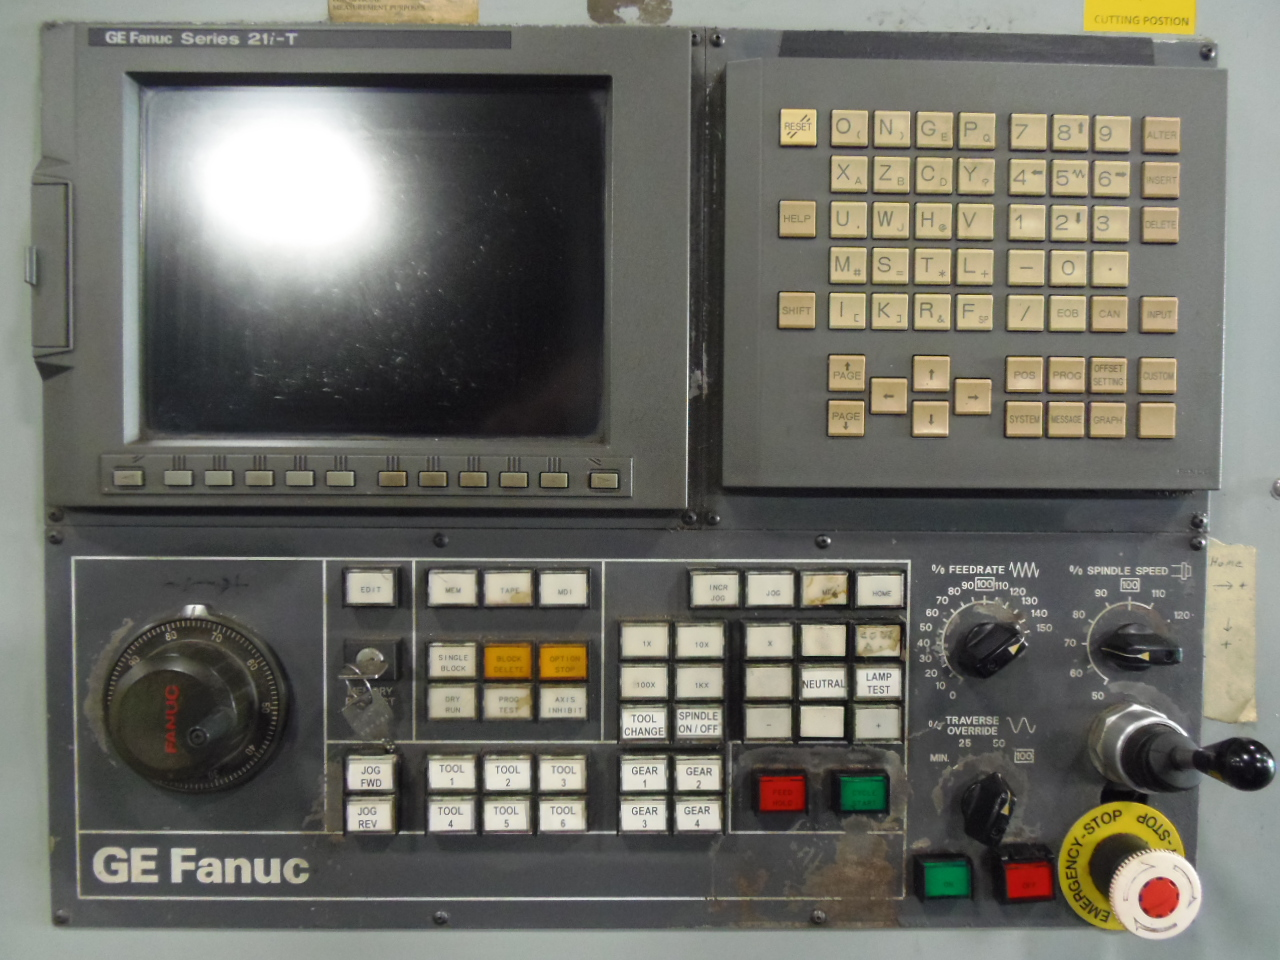 "MORI SEIKI SL-8, 80/98, FANUC 21iT CONTROL, 39.3"" SWING, 32"" 4 JAW CHUCK, 43"" Z, 10.25"" HOLE, 4 - 553 RPM"